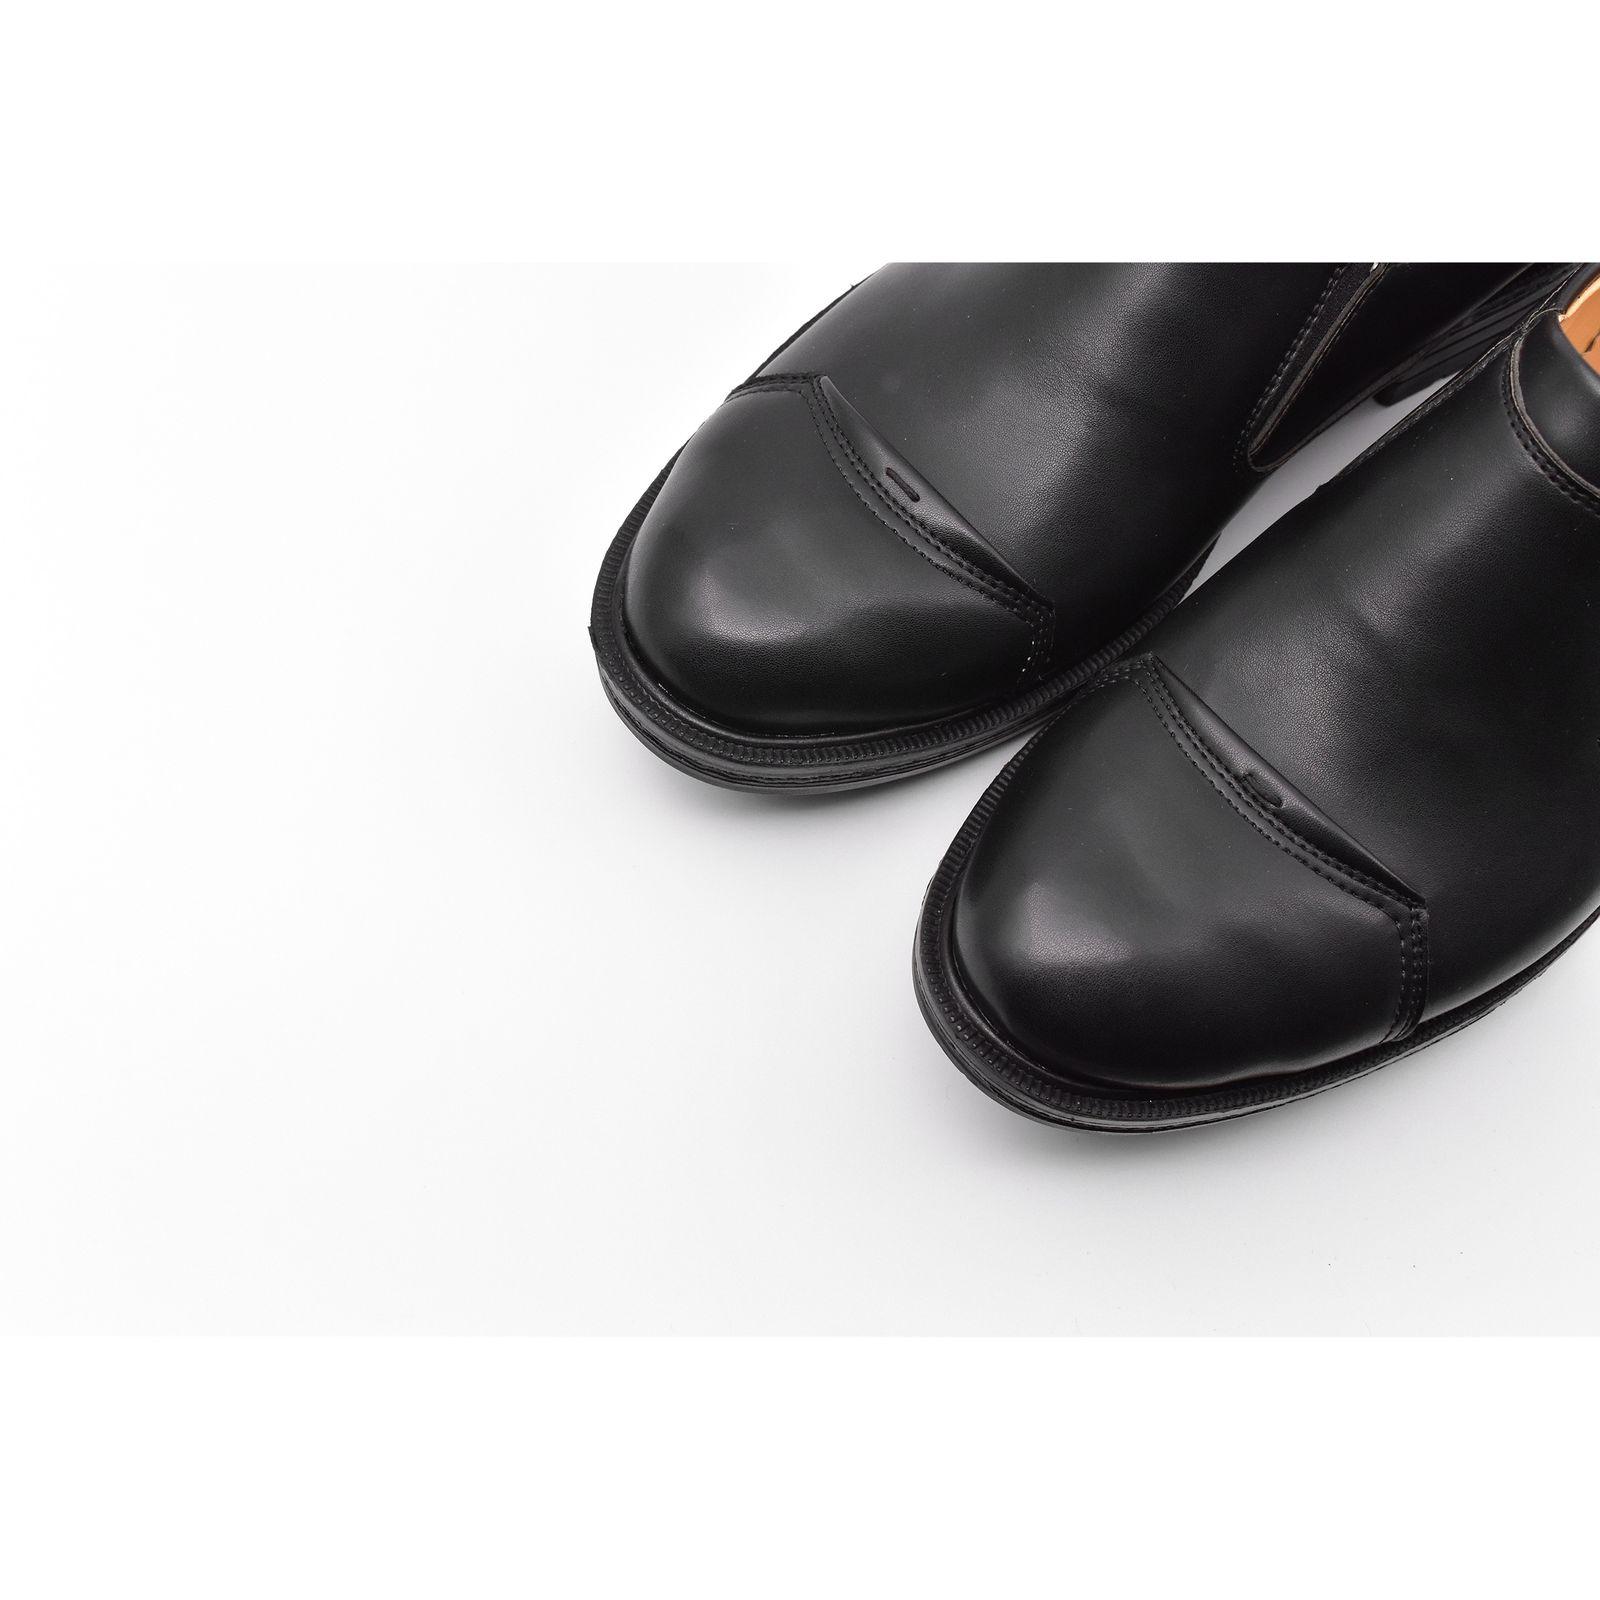 کفش مردانه سینگل مدل سهیل کد 6510 -  - 3